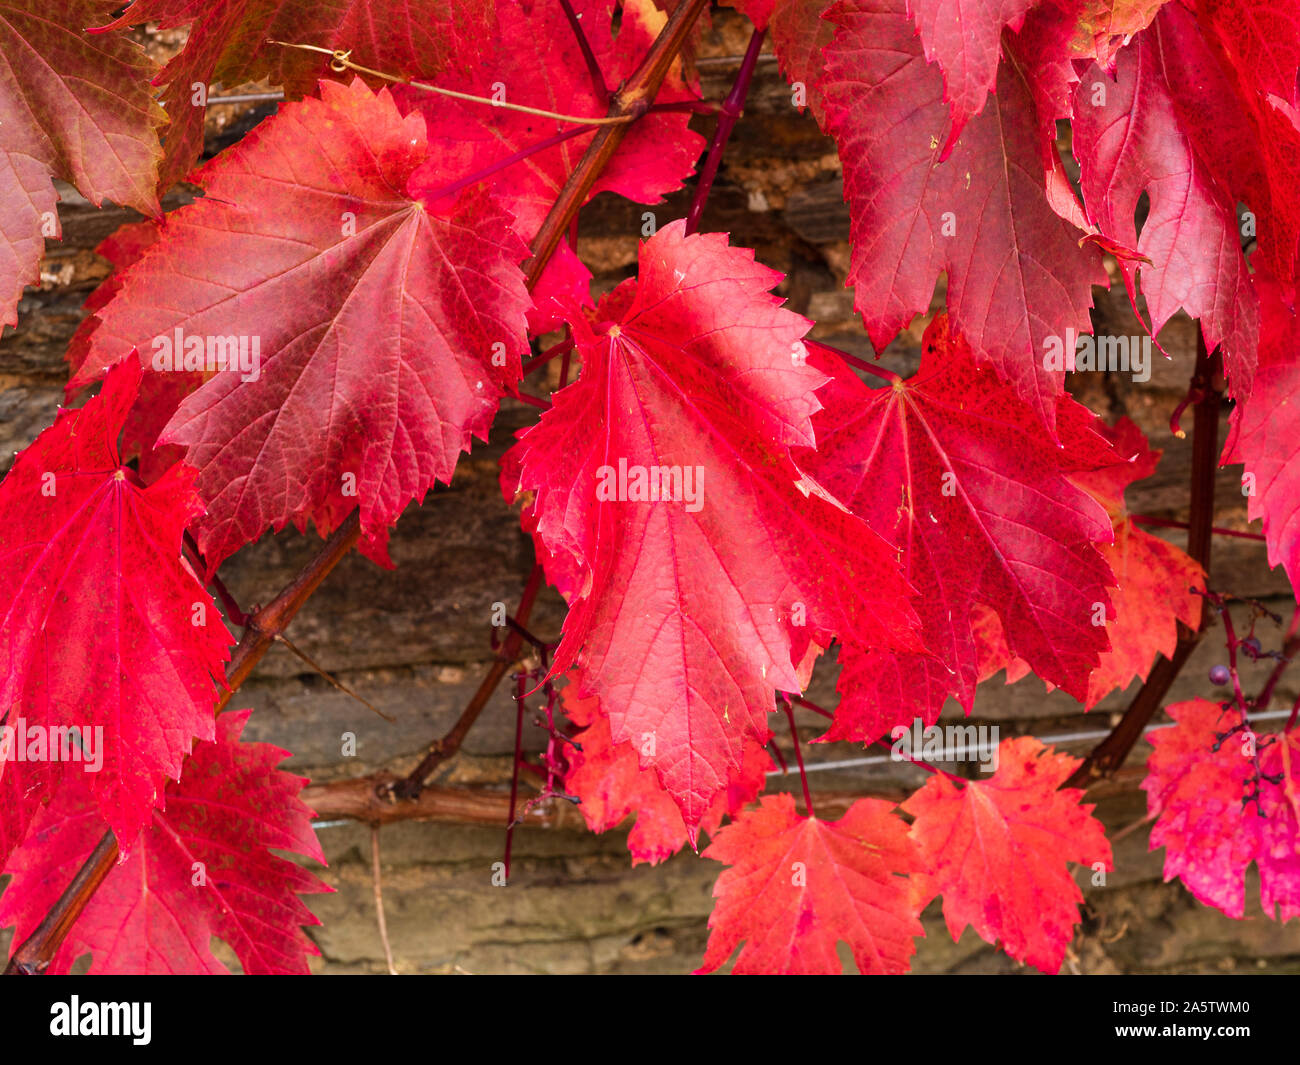 Red bronze autumn foliage of the ornamental grape vine, Vitis vinifera 'Spetchley Red' Stock Photo